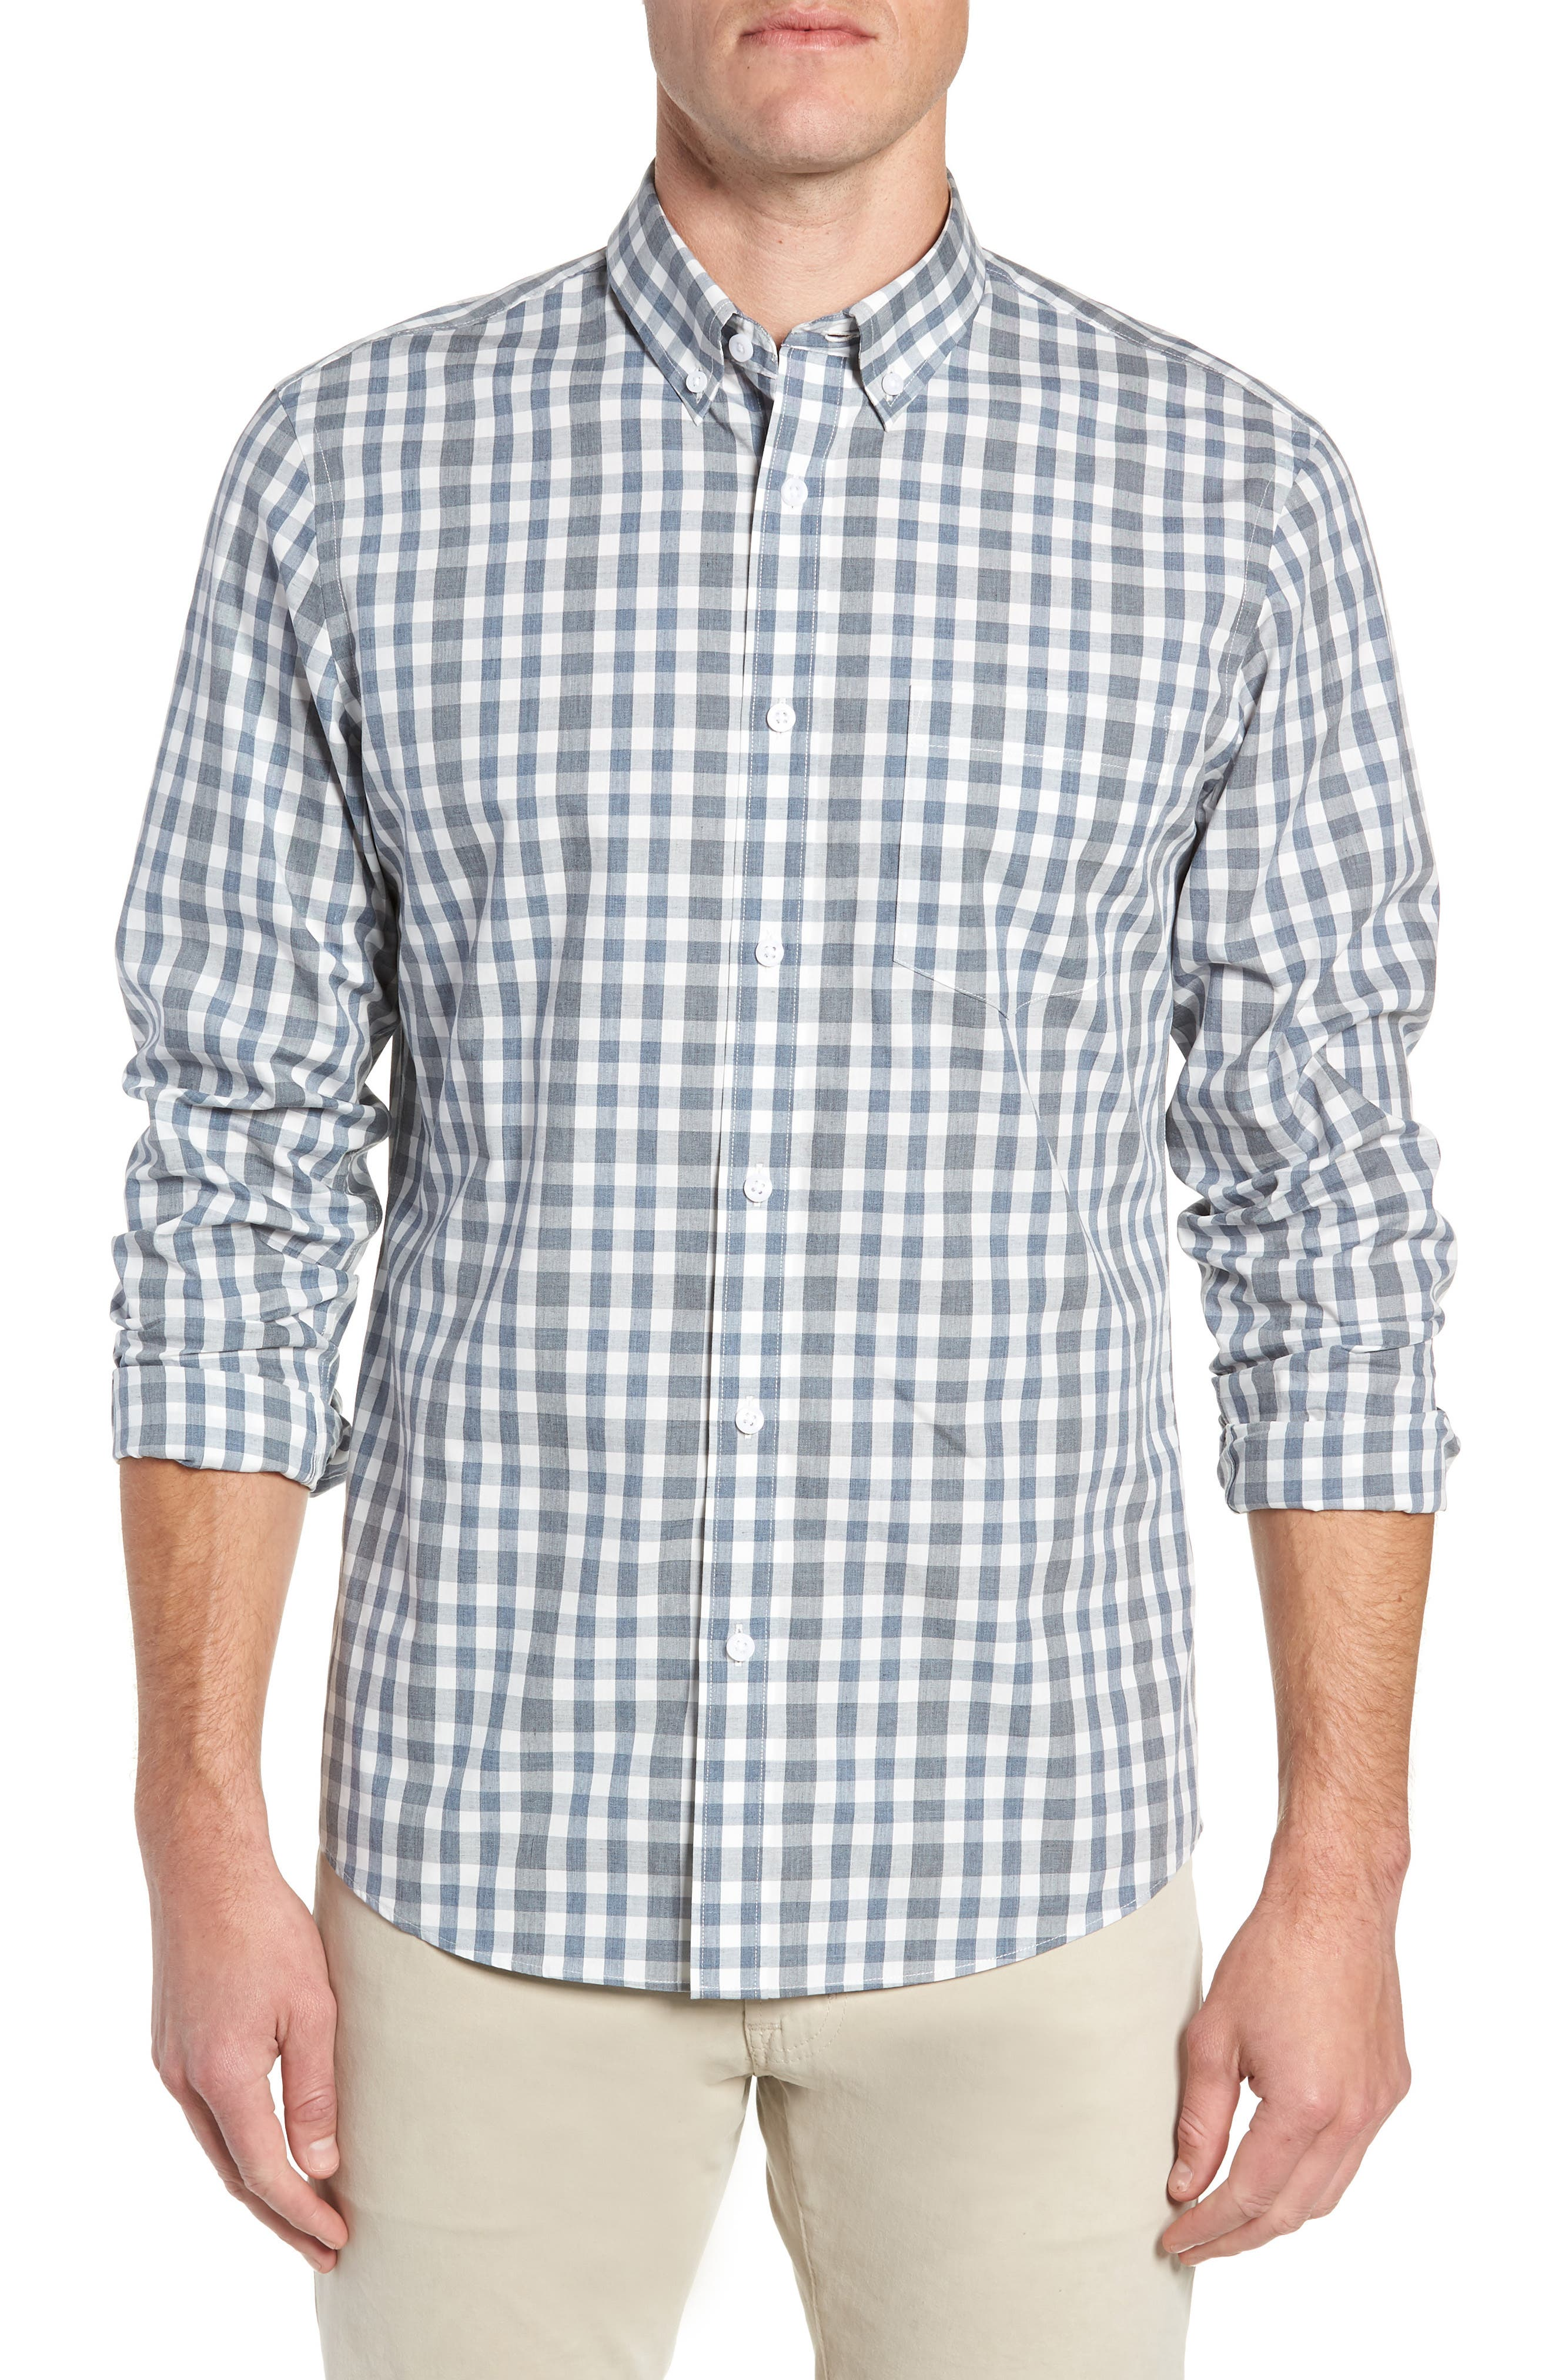 Nordstrom Shop Traditional Fit Plaid Sport Shirt, Blue